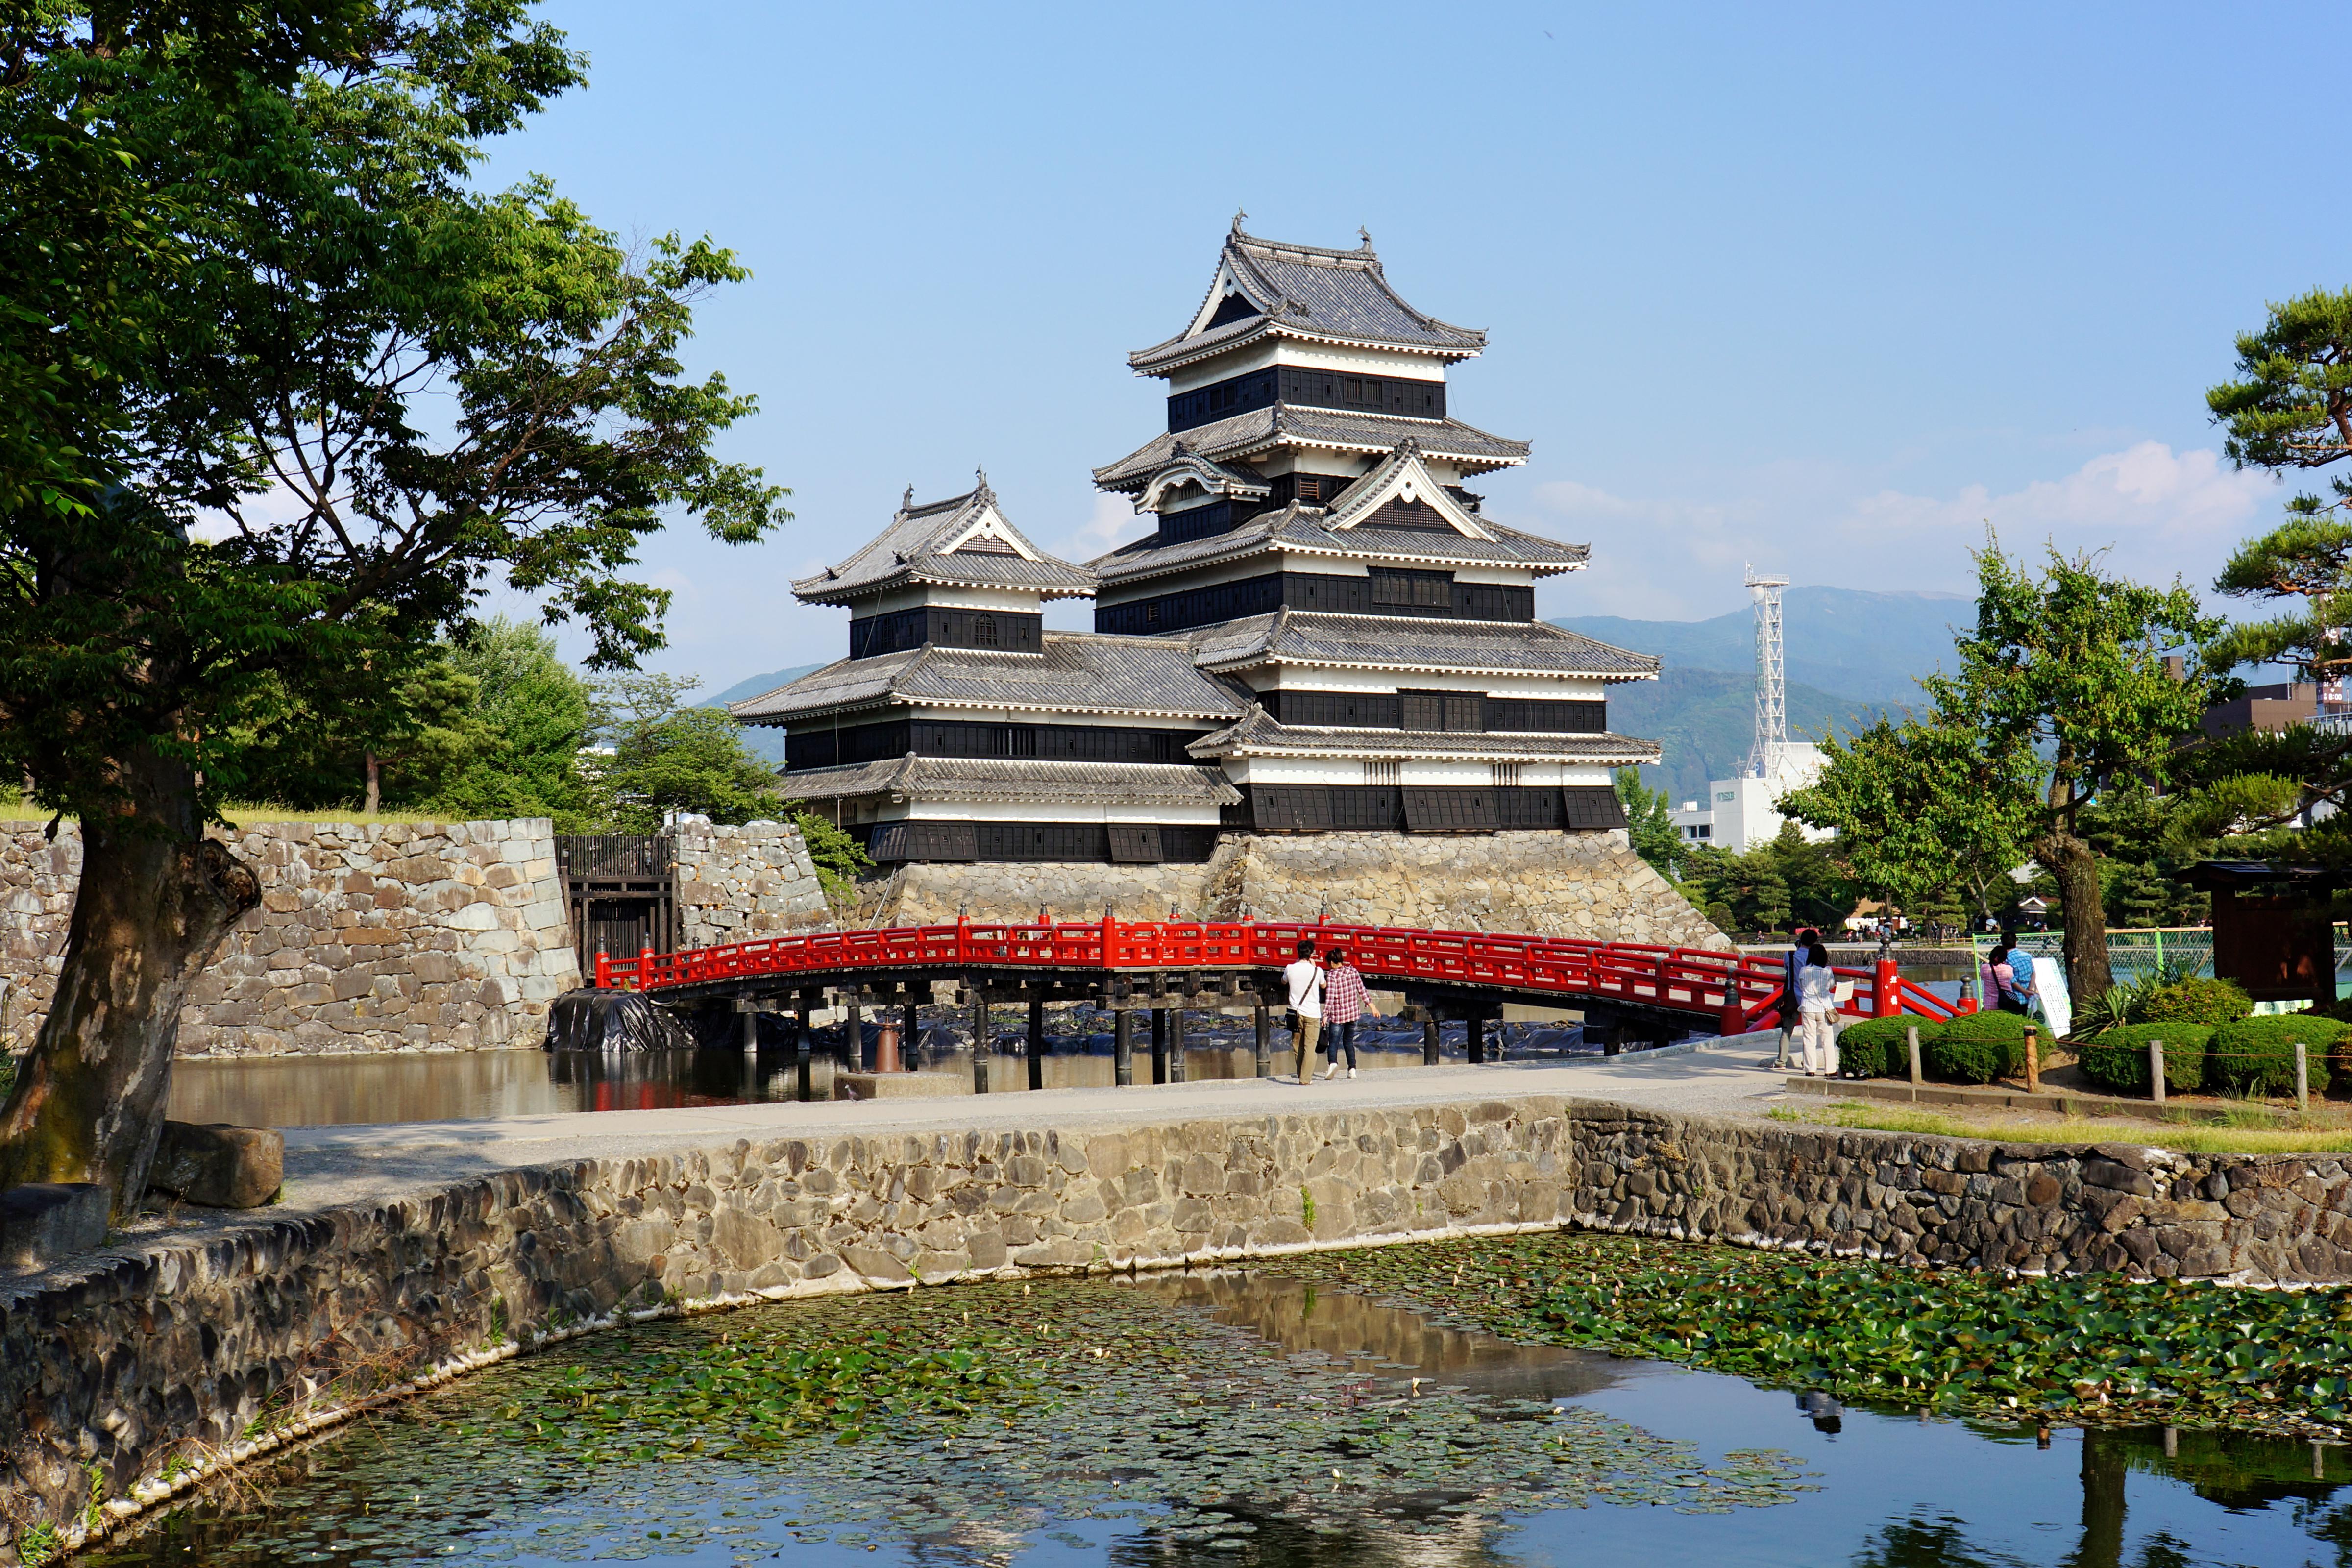 File:130608 Matsumoto Castle Matsumoto Nagano pref Japan01bs5.jpg - Wikimedia...